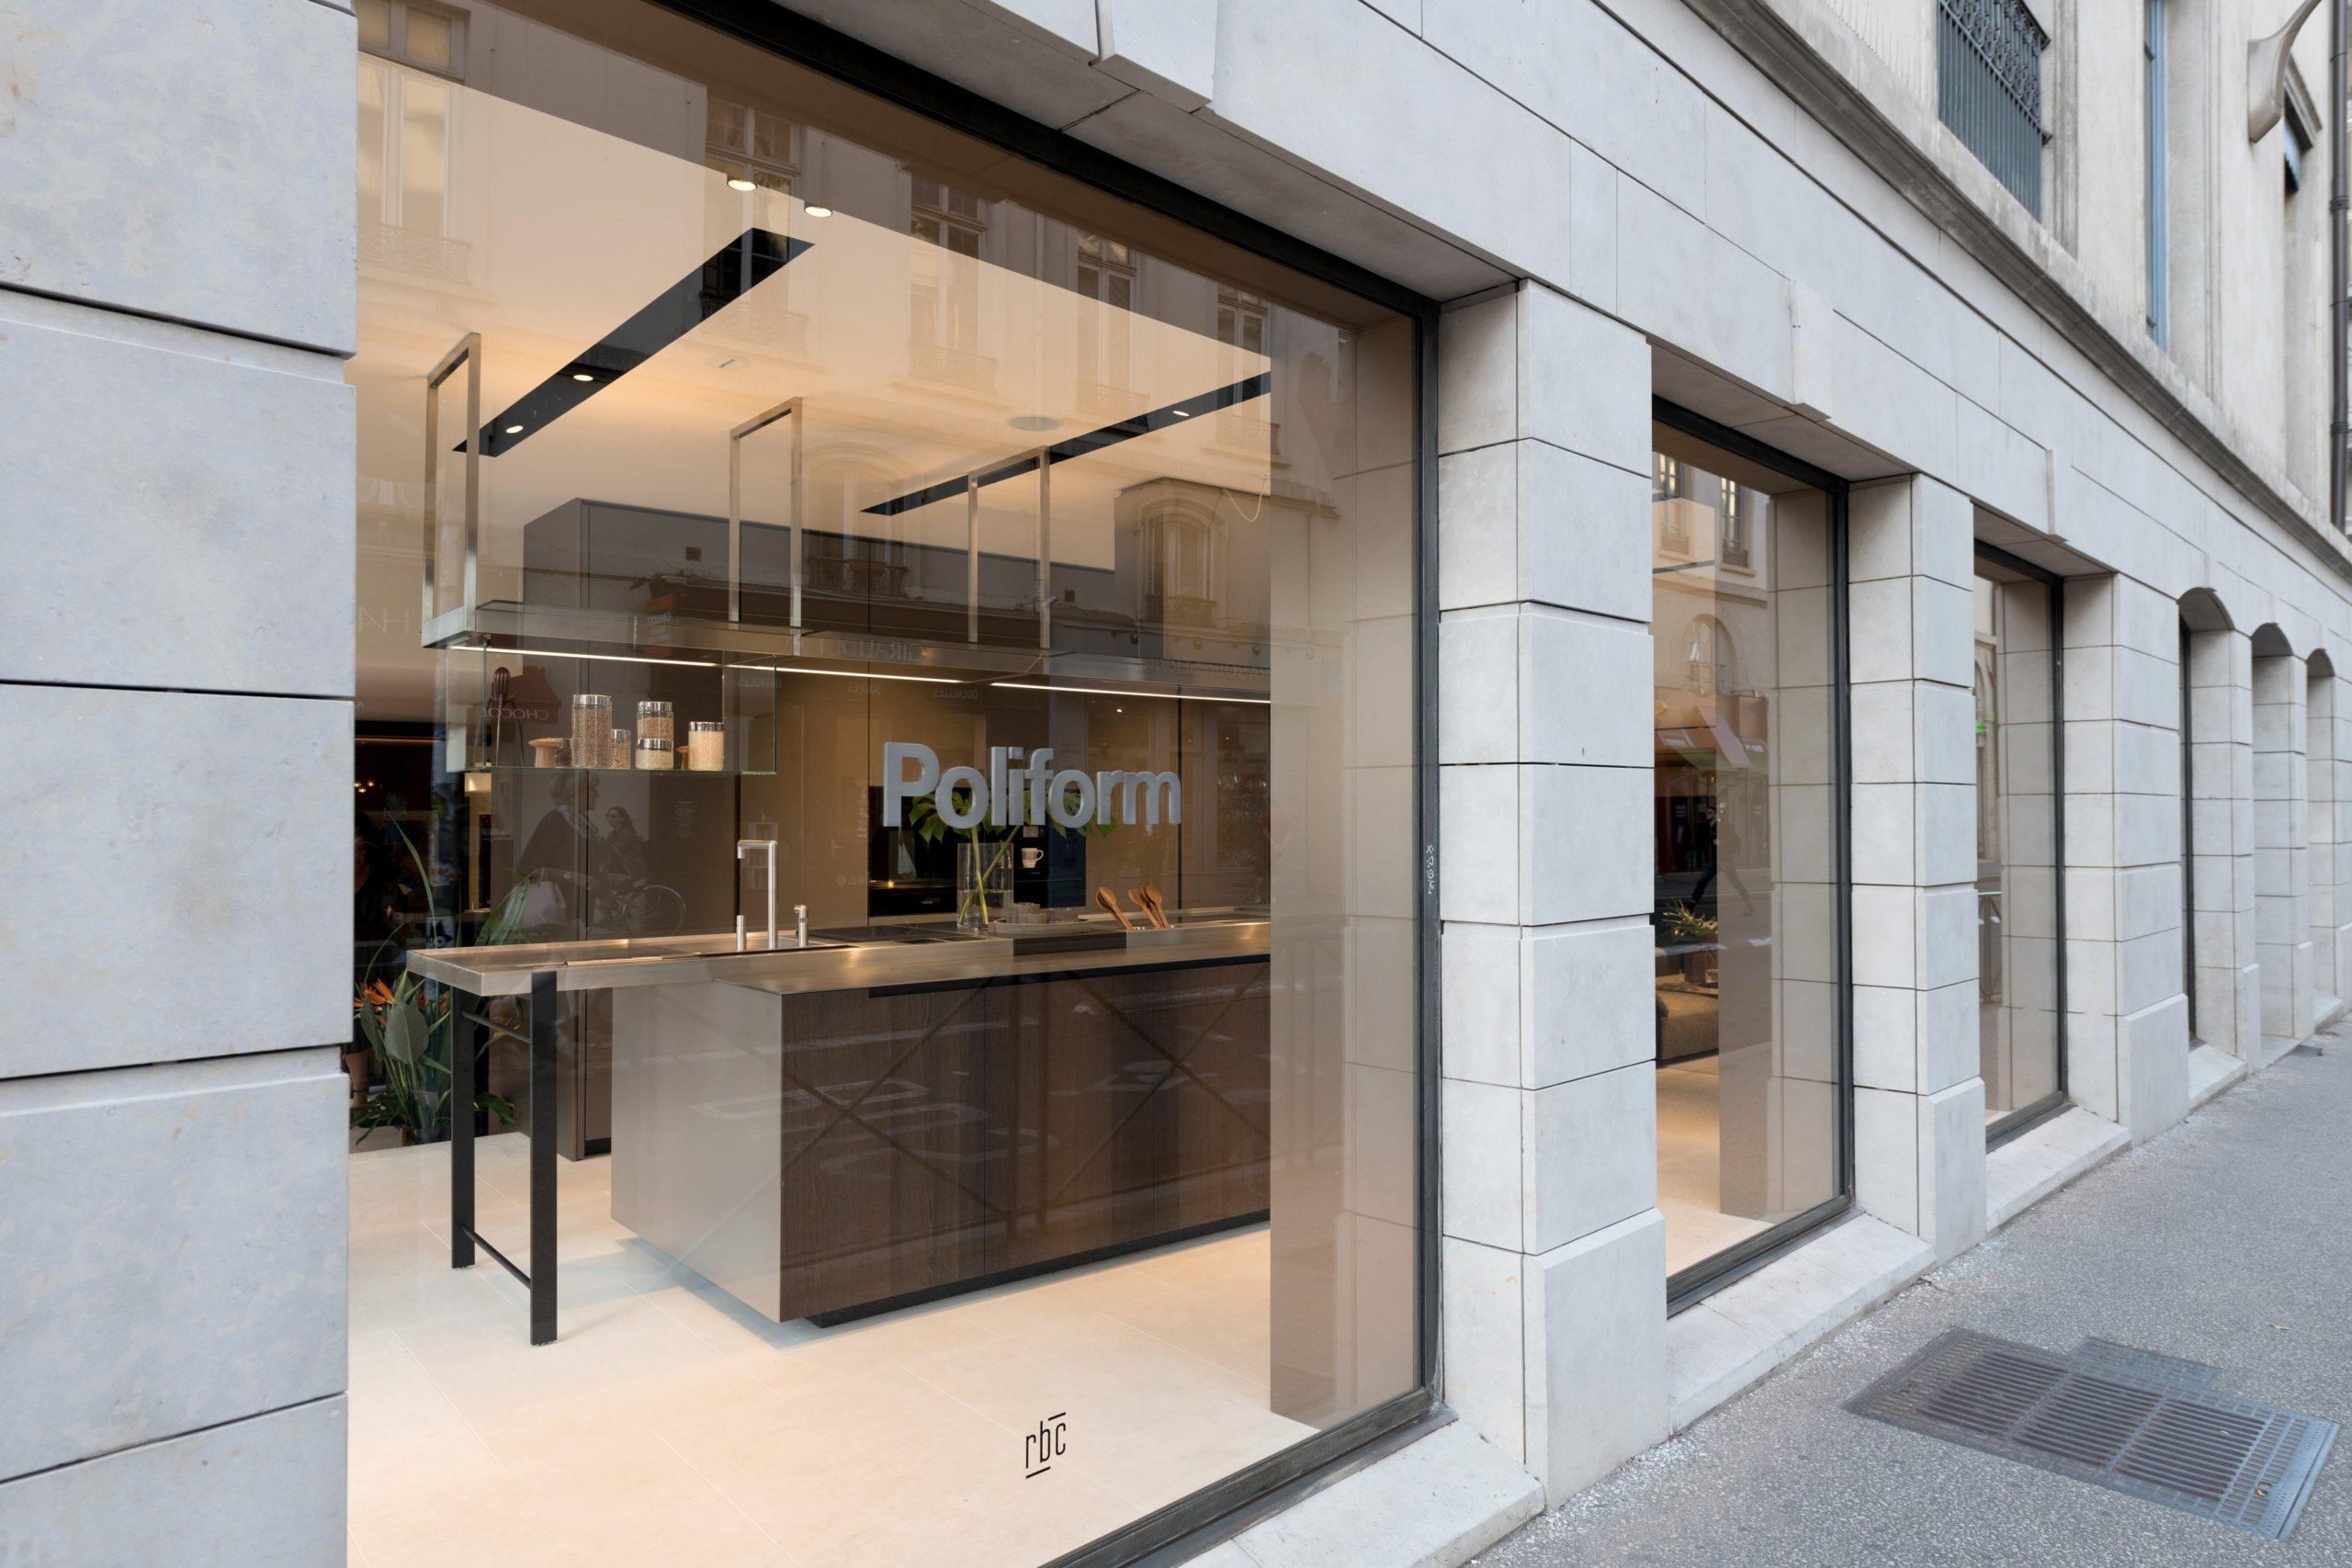 Showroom Poliform Lyon Centre-ville